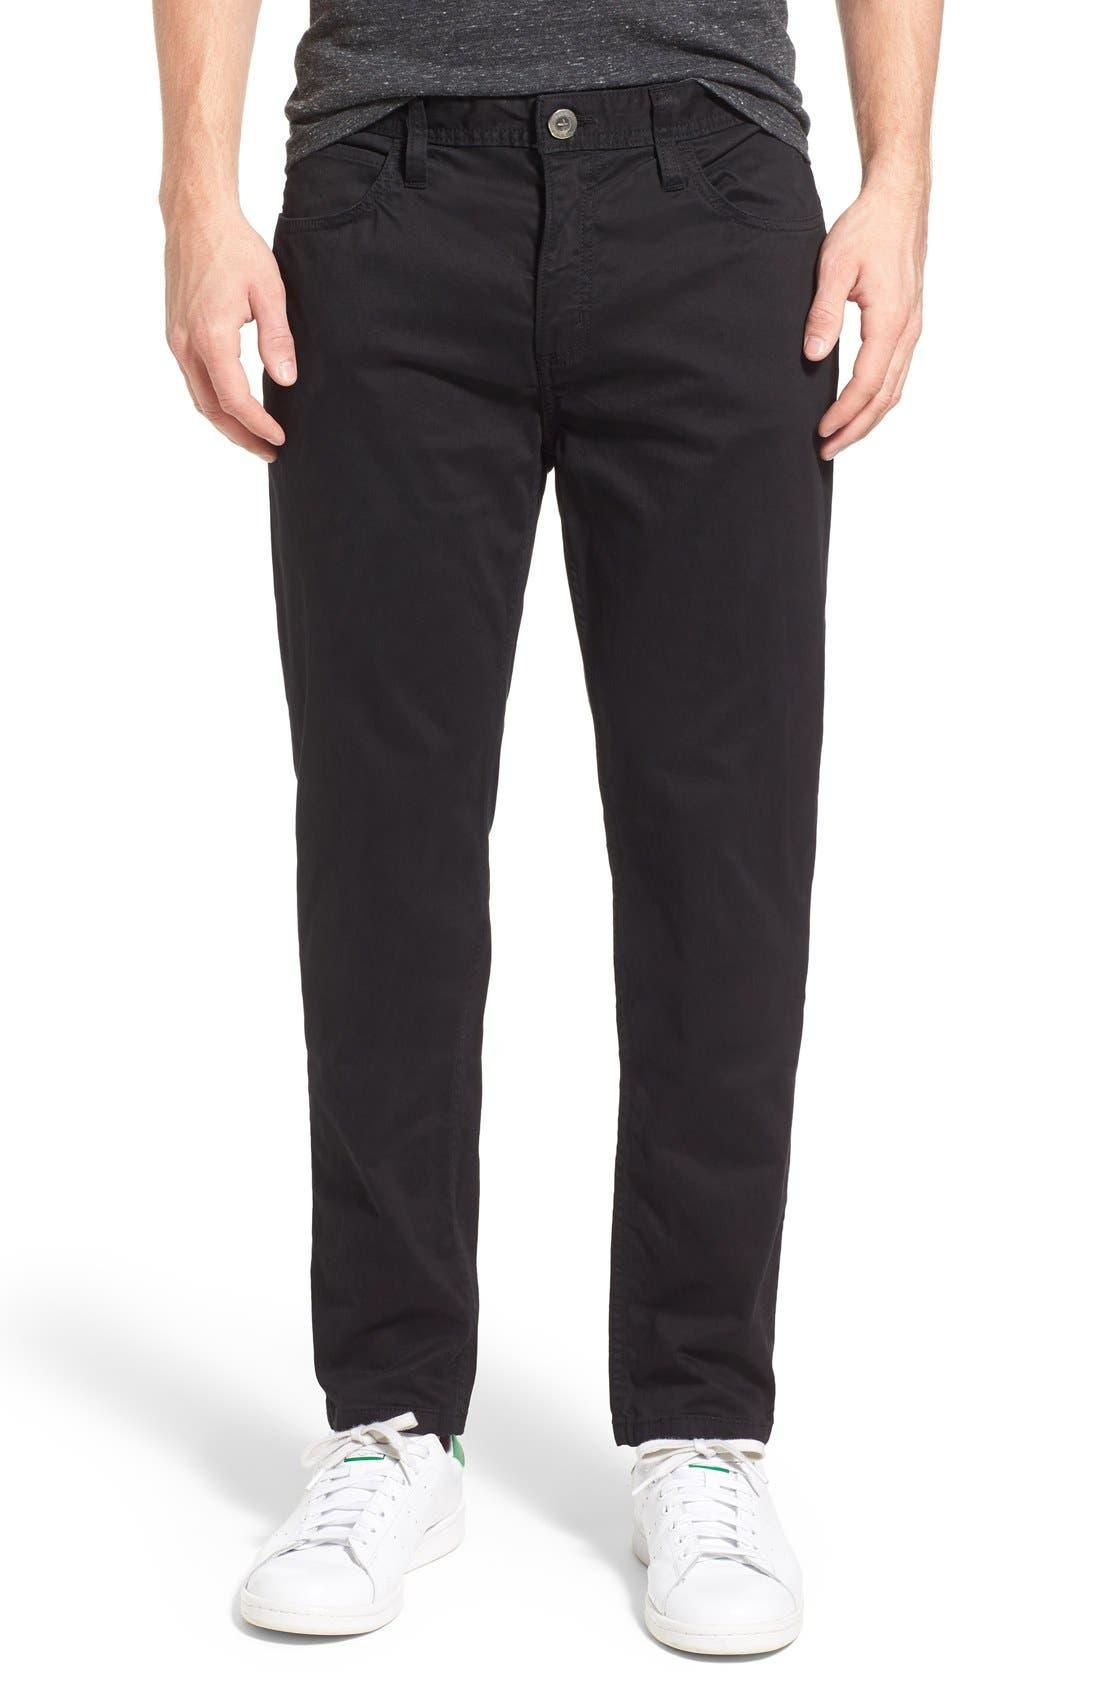 'Silverlake' Pants,                             Main thumbnail 1, color,                             Black